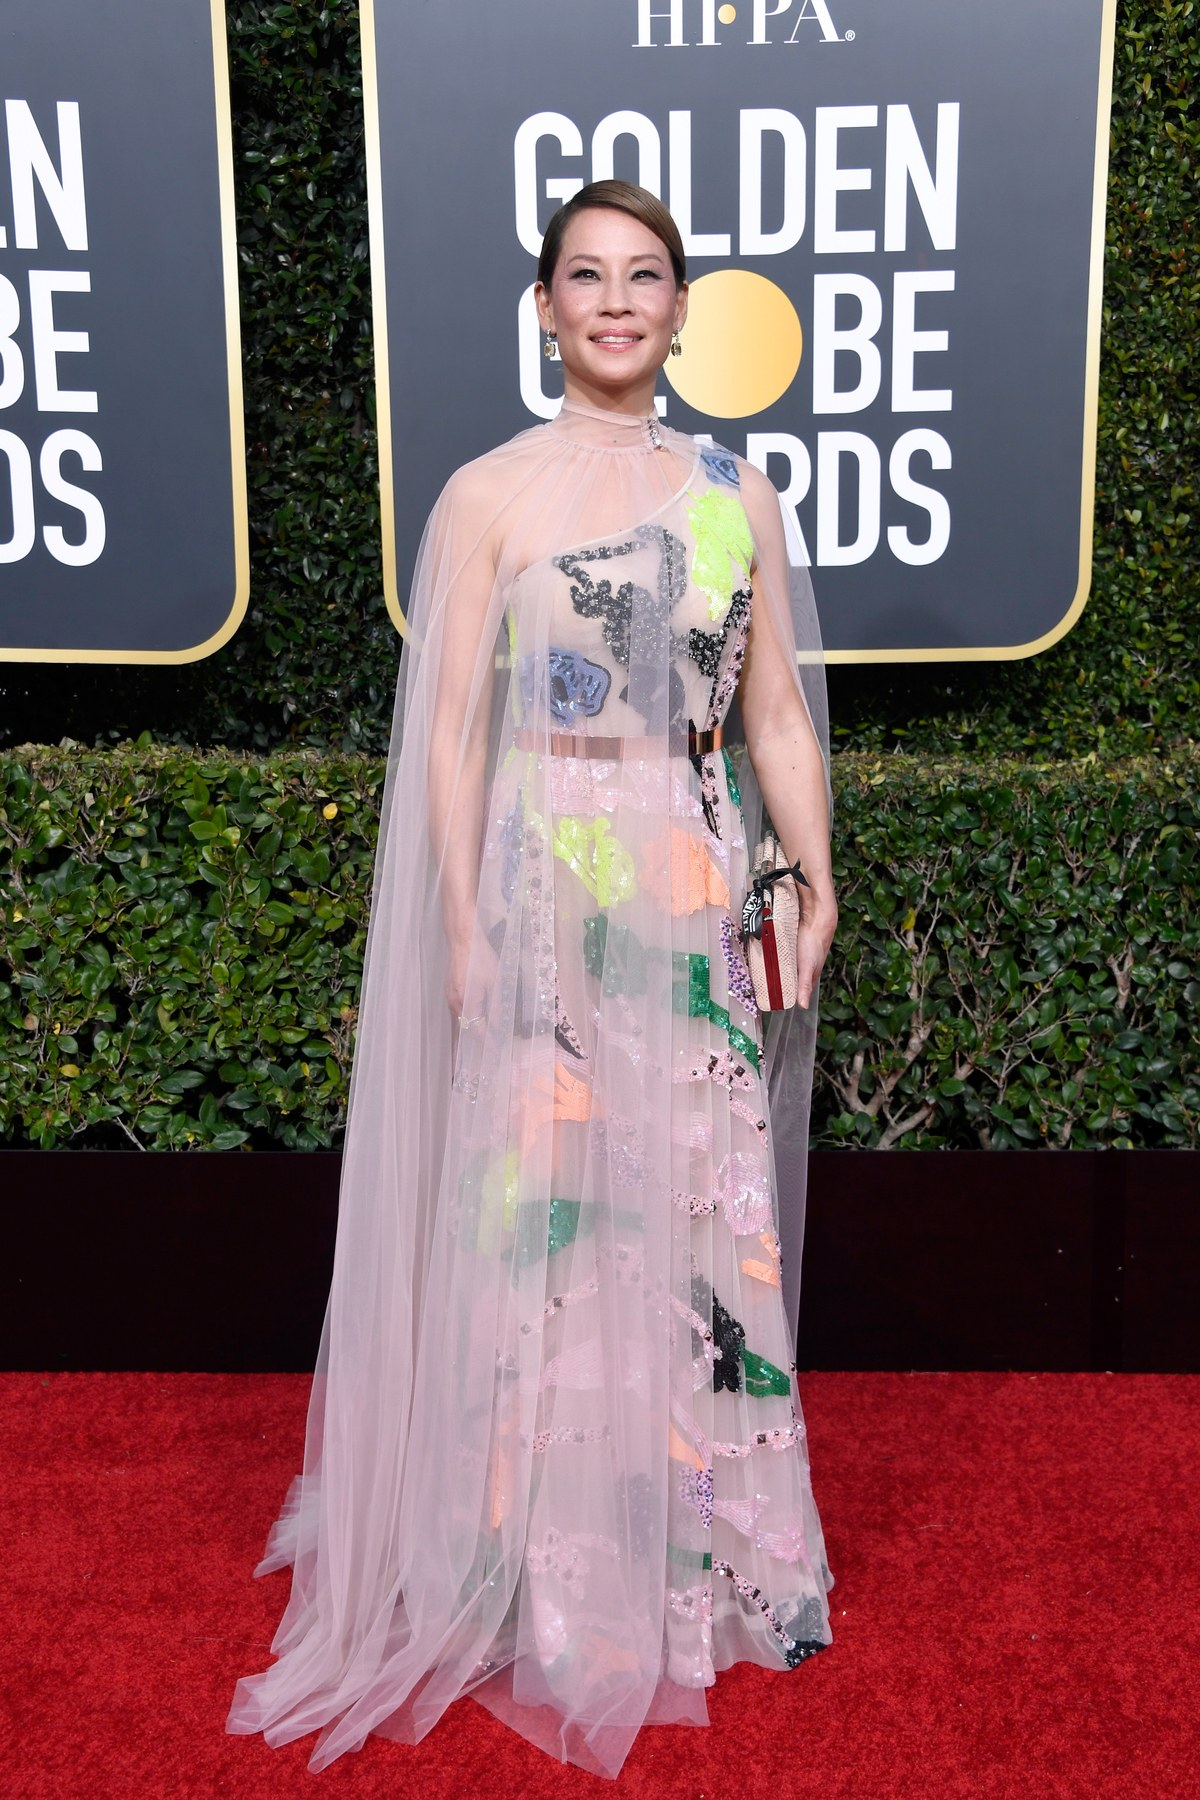 Lucy Liu wearing Galia Lahav Couture Golden Globes